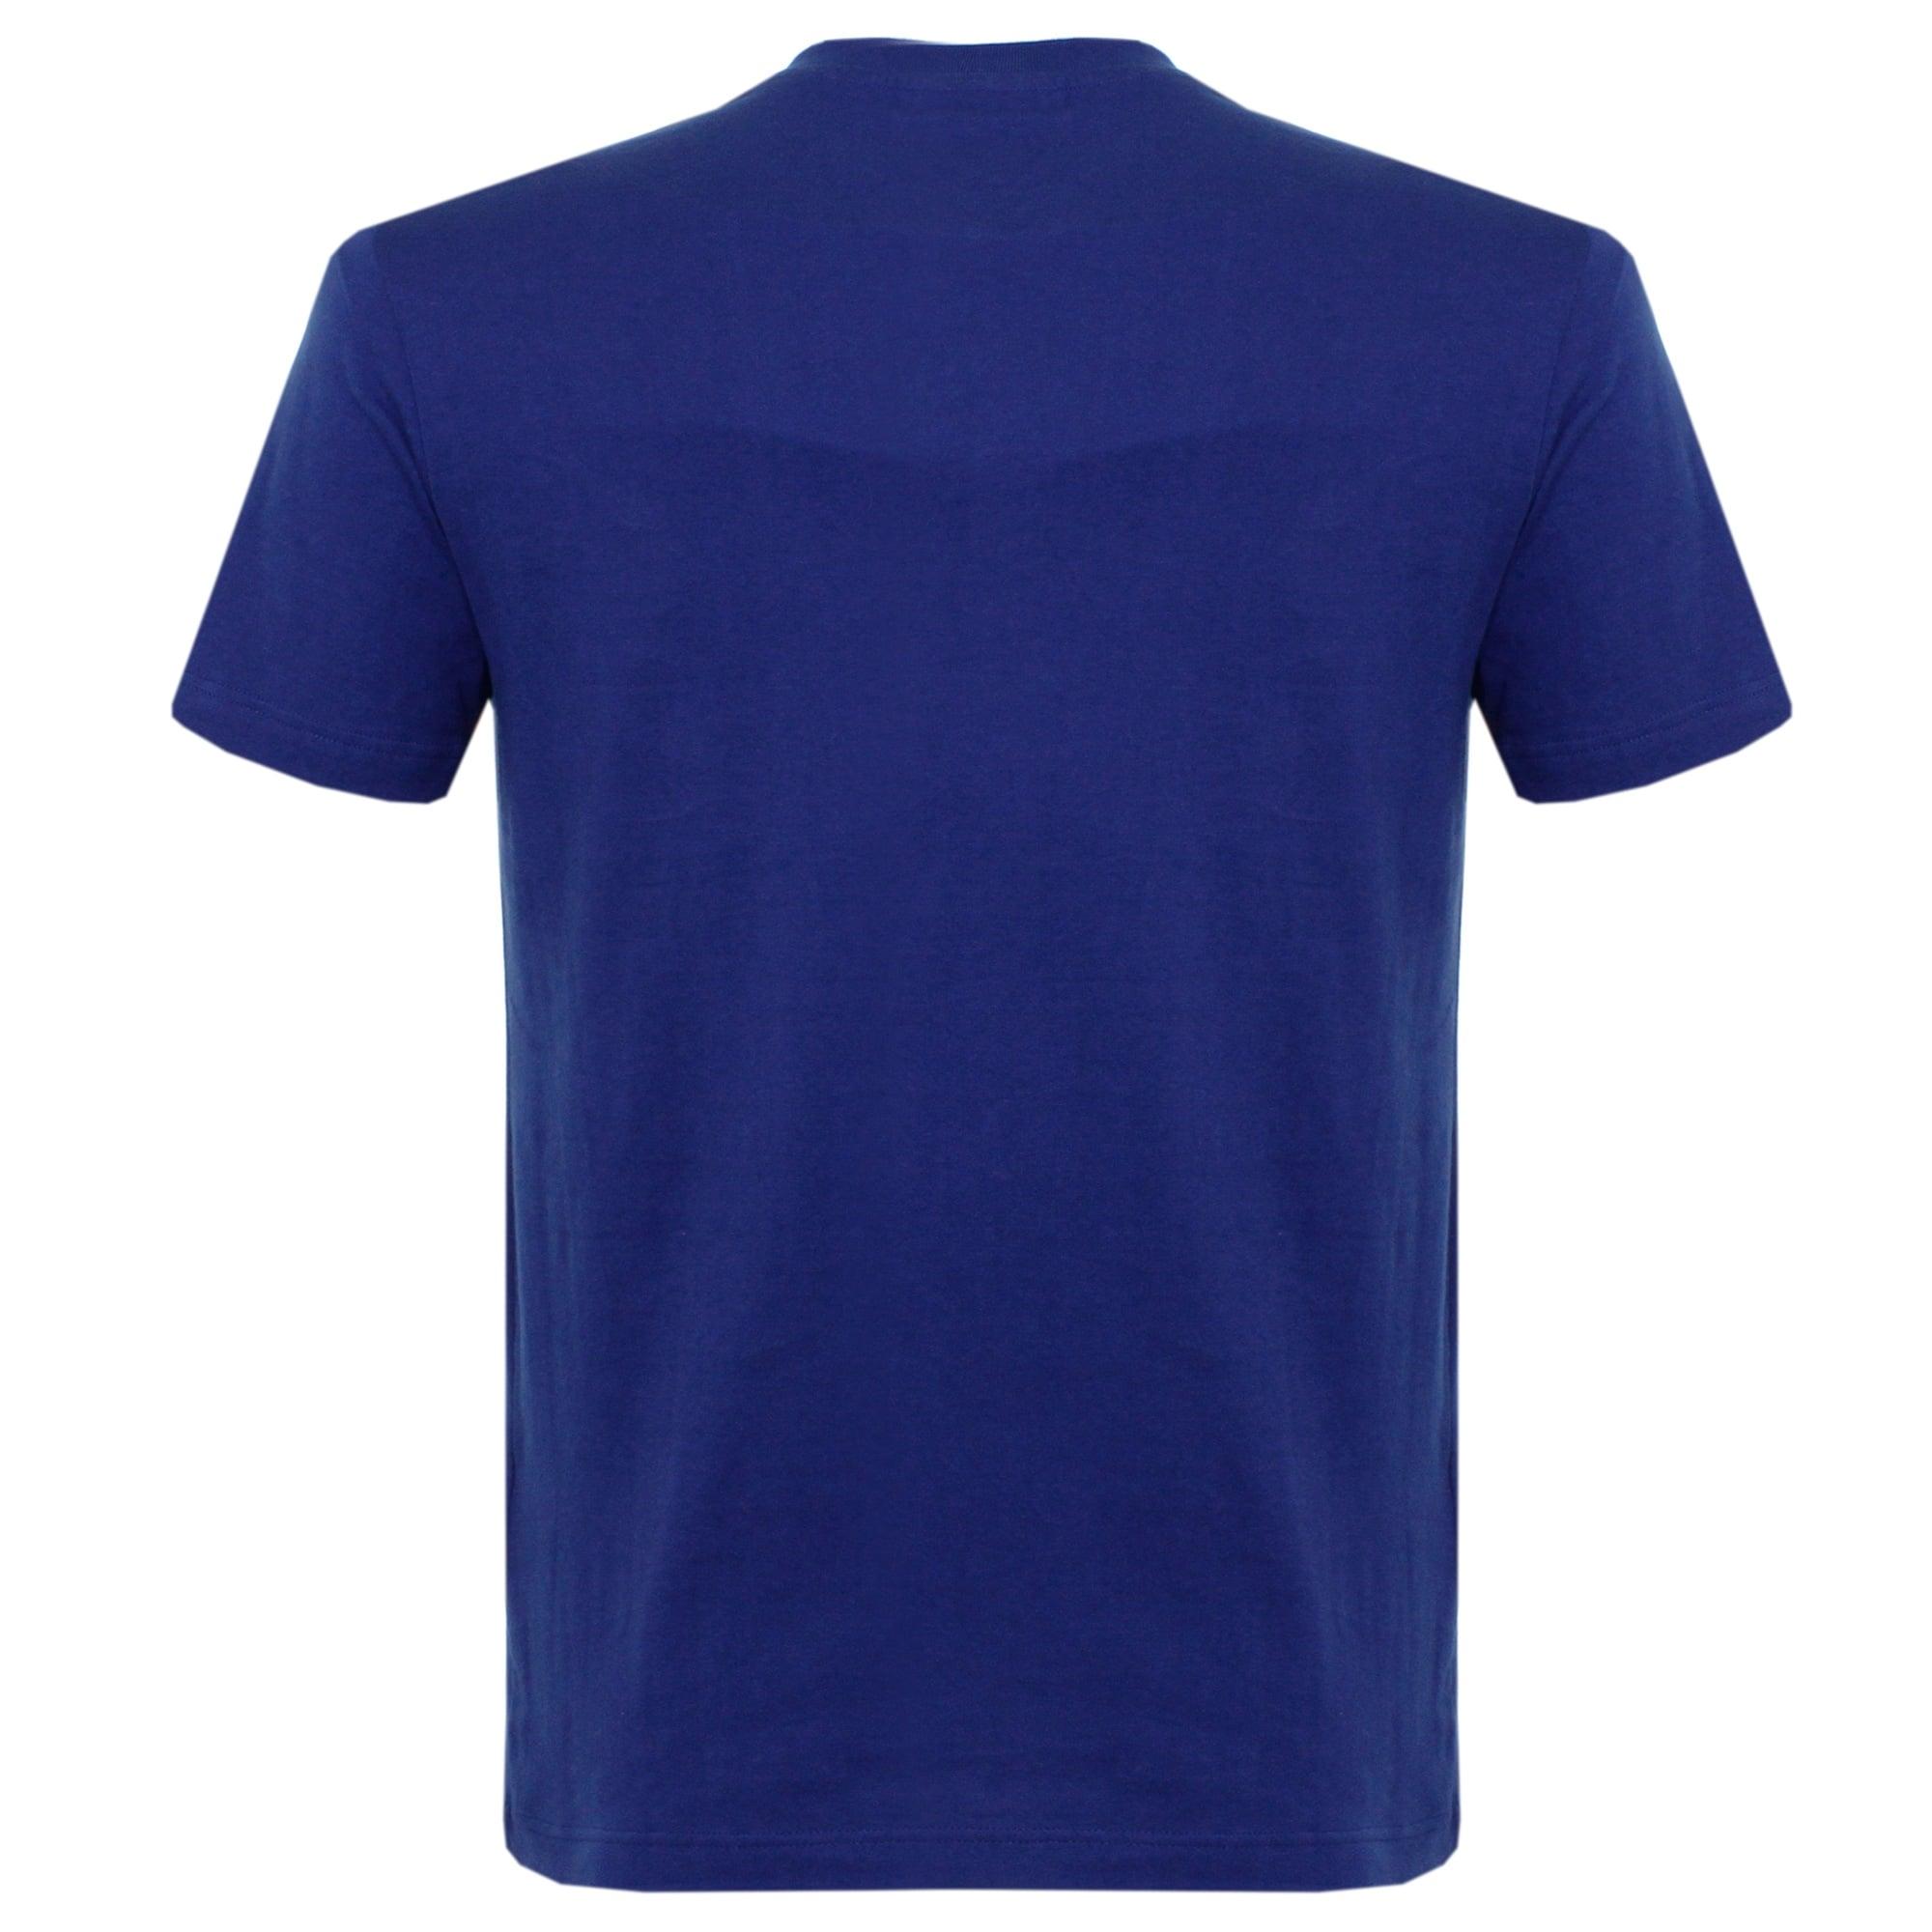 t shirt lacoste bleu